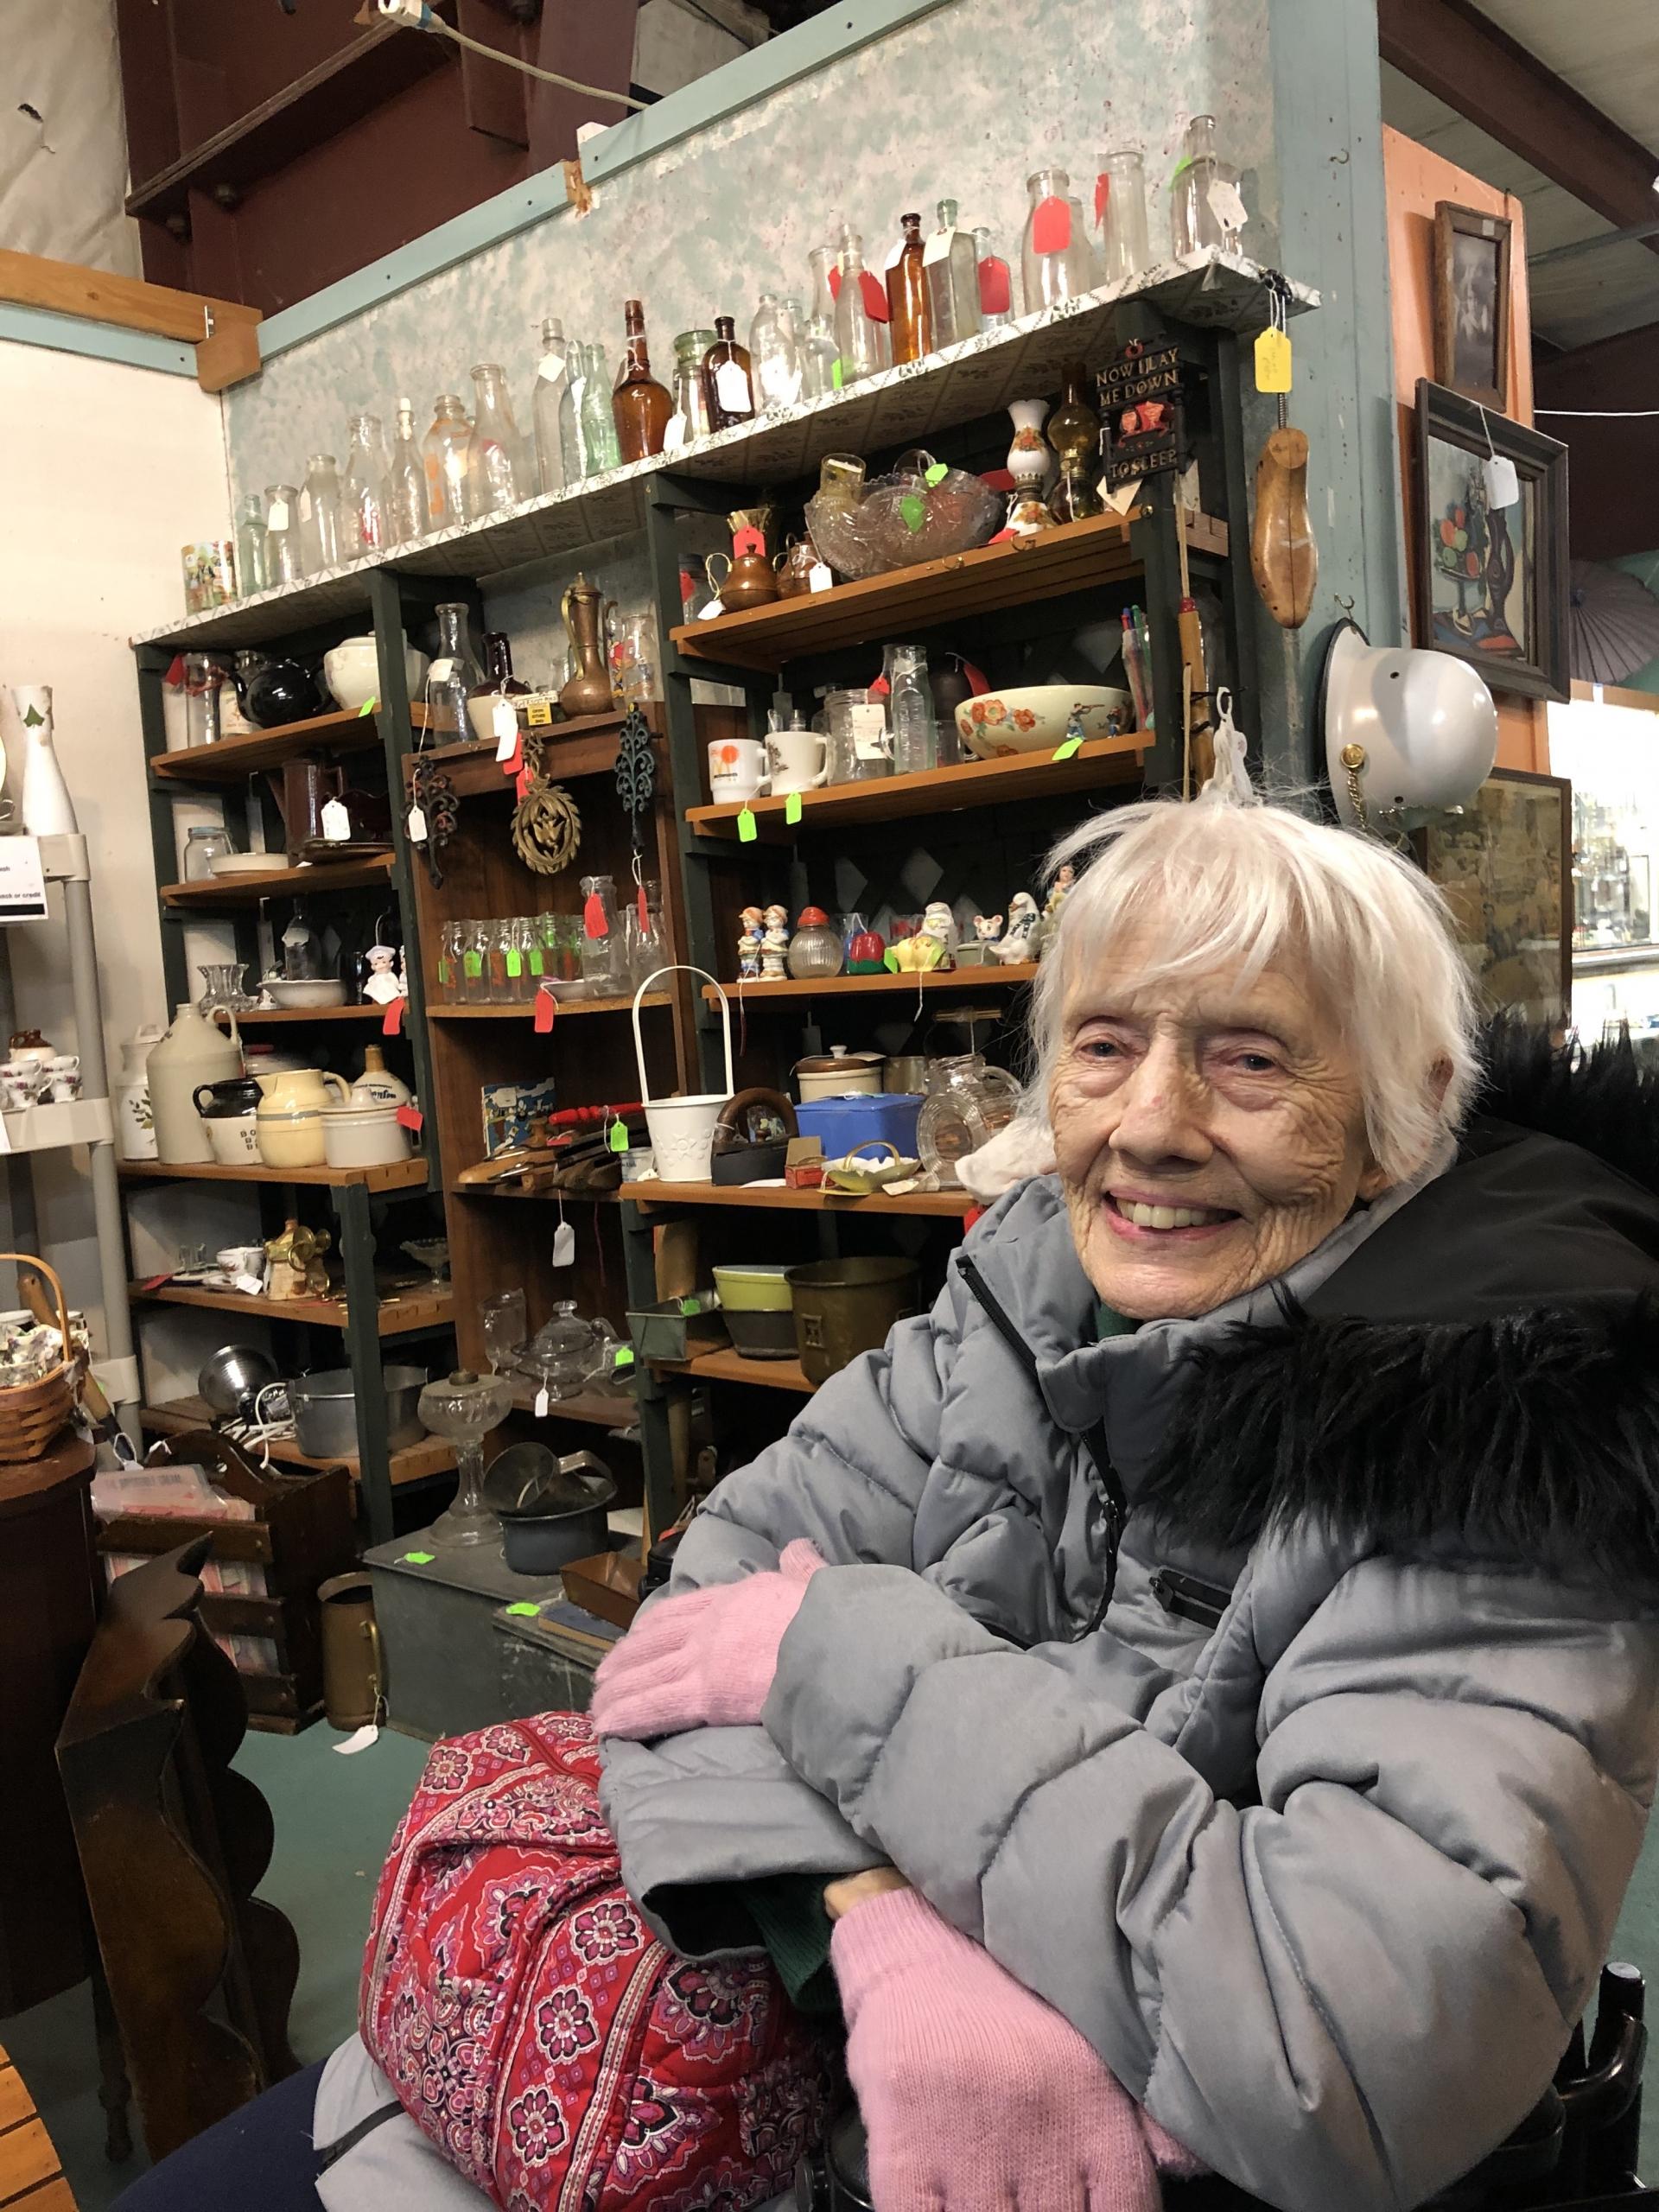 Joanne Zarger - Scranberry Coop - Vintage Store - Antiques, Collectibles, & More